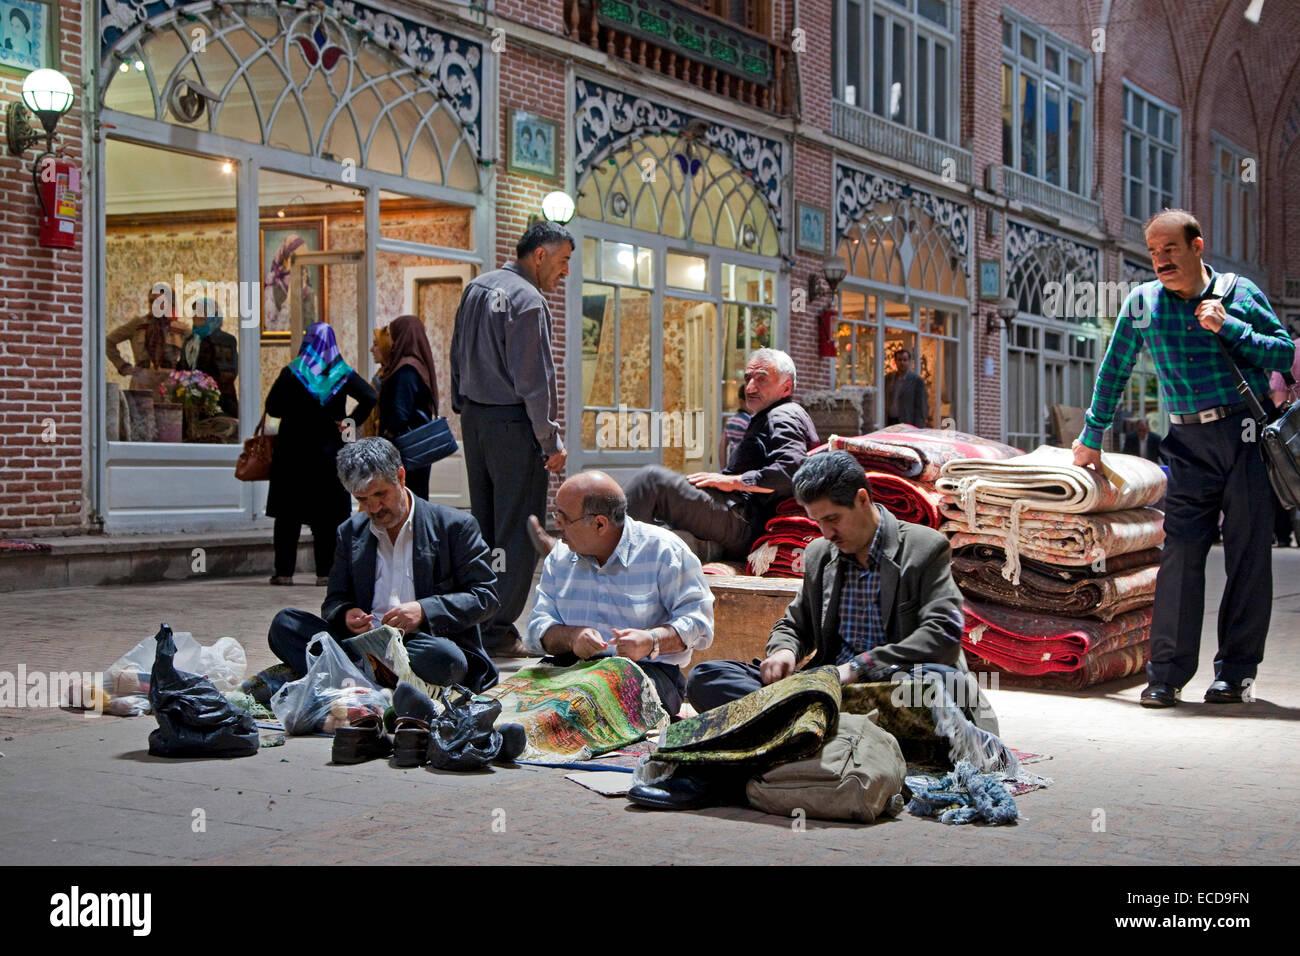 Iranian men repairing carpets in the old historic bazaar of the city Tabriz, East Azerbaijan, Iran - Stock Image